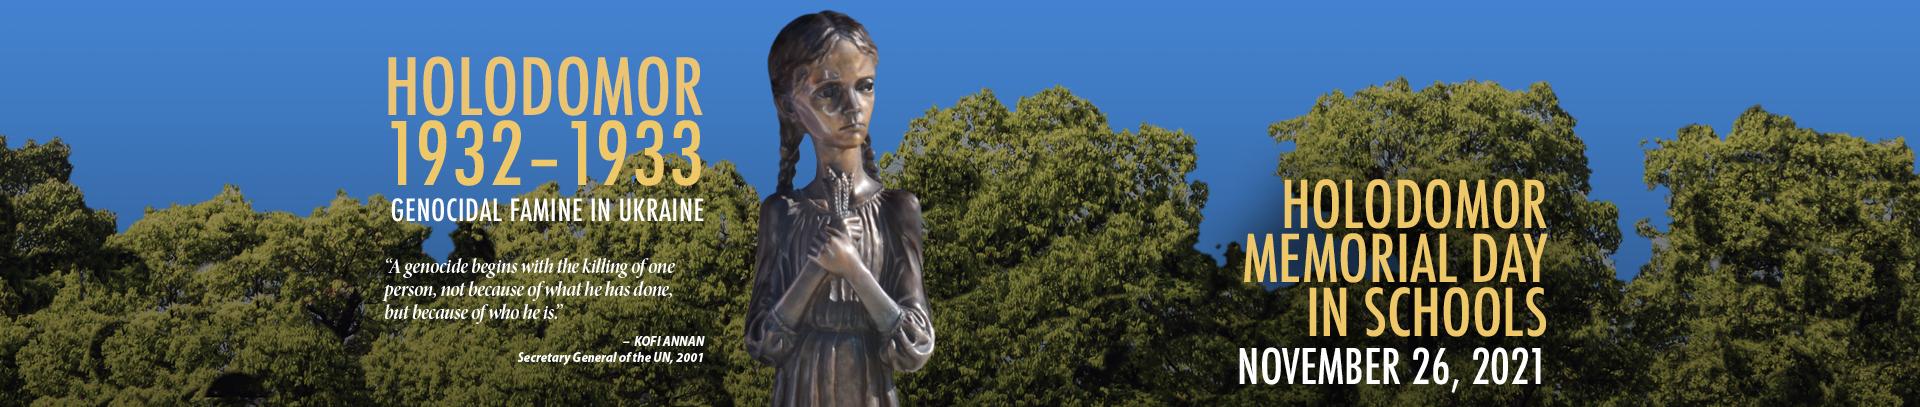 Holodomor Memorial Day 2021